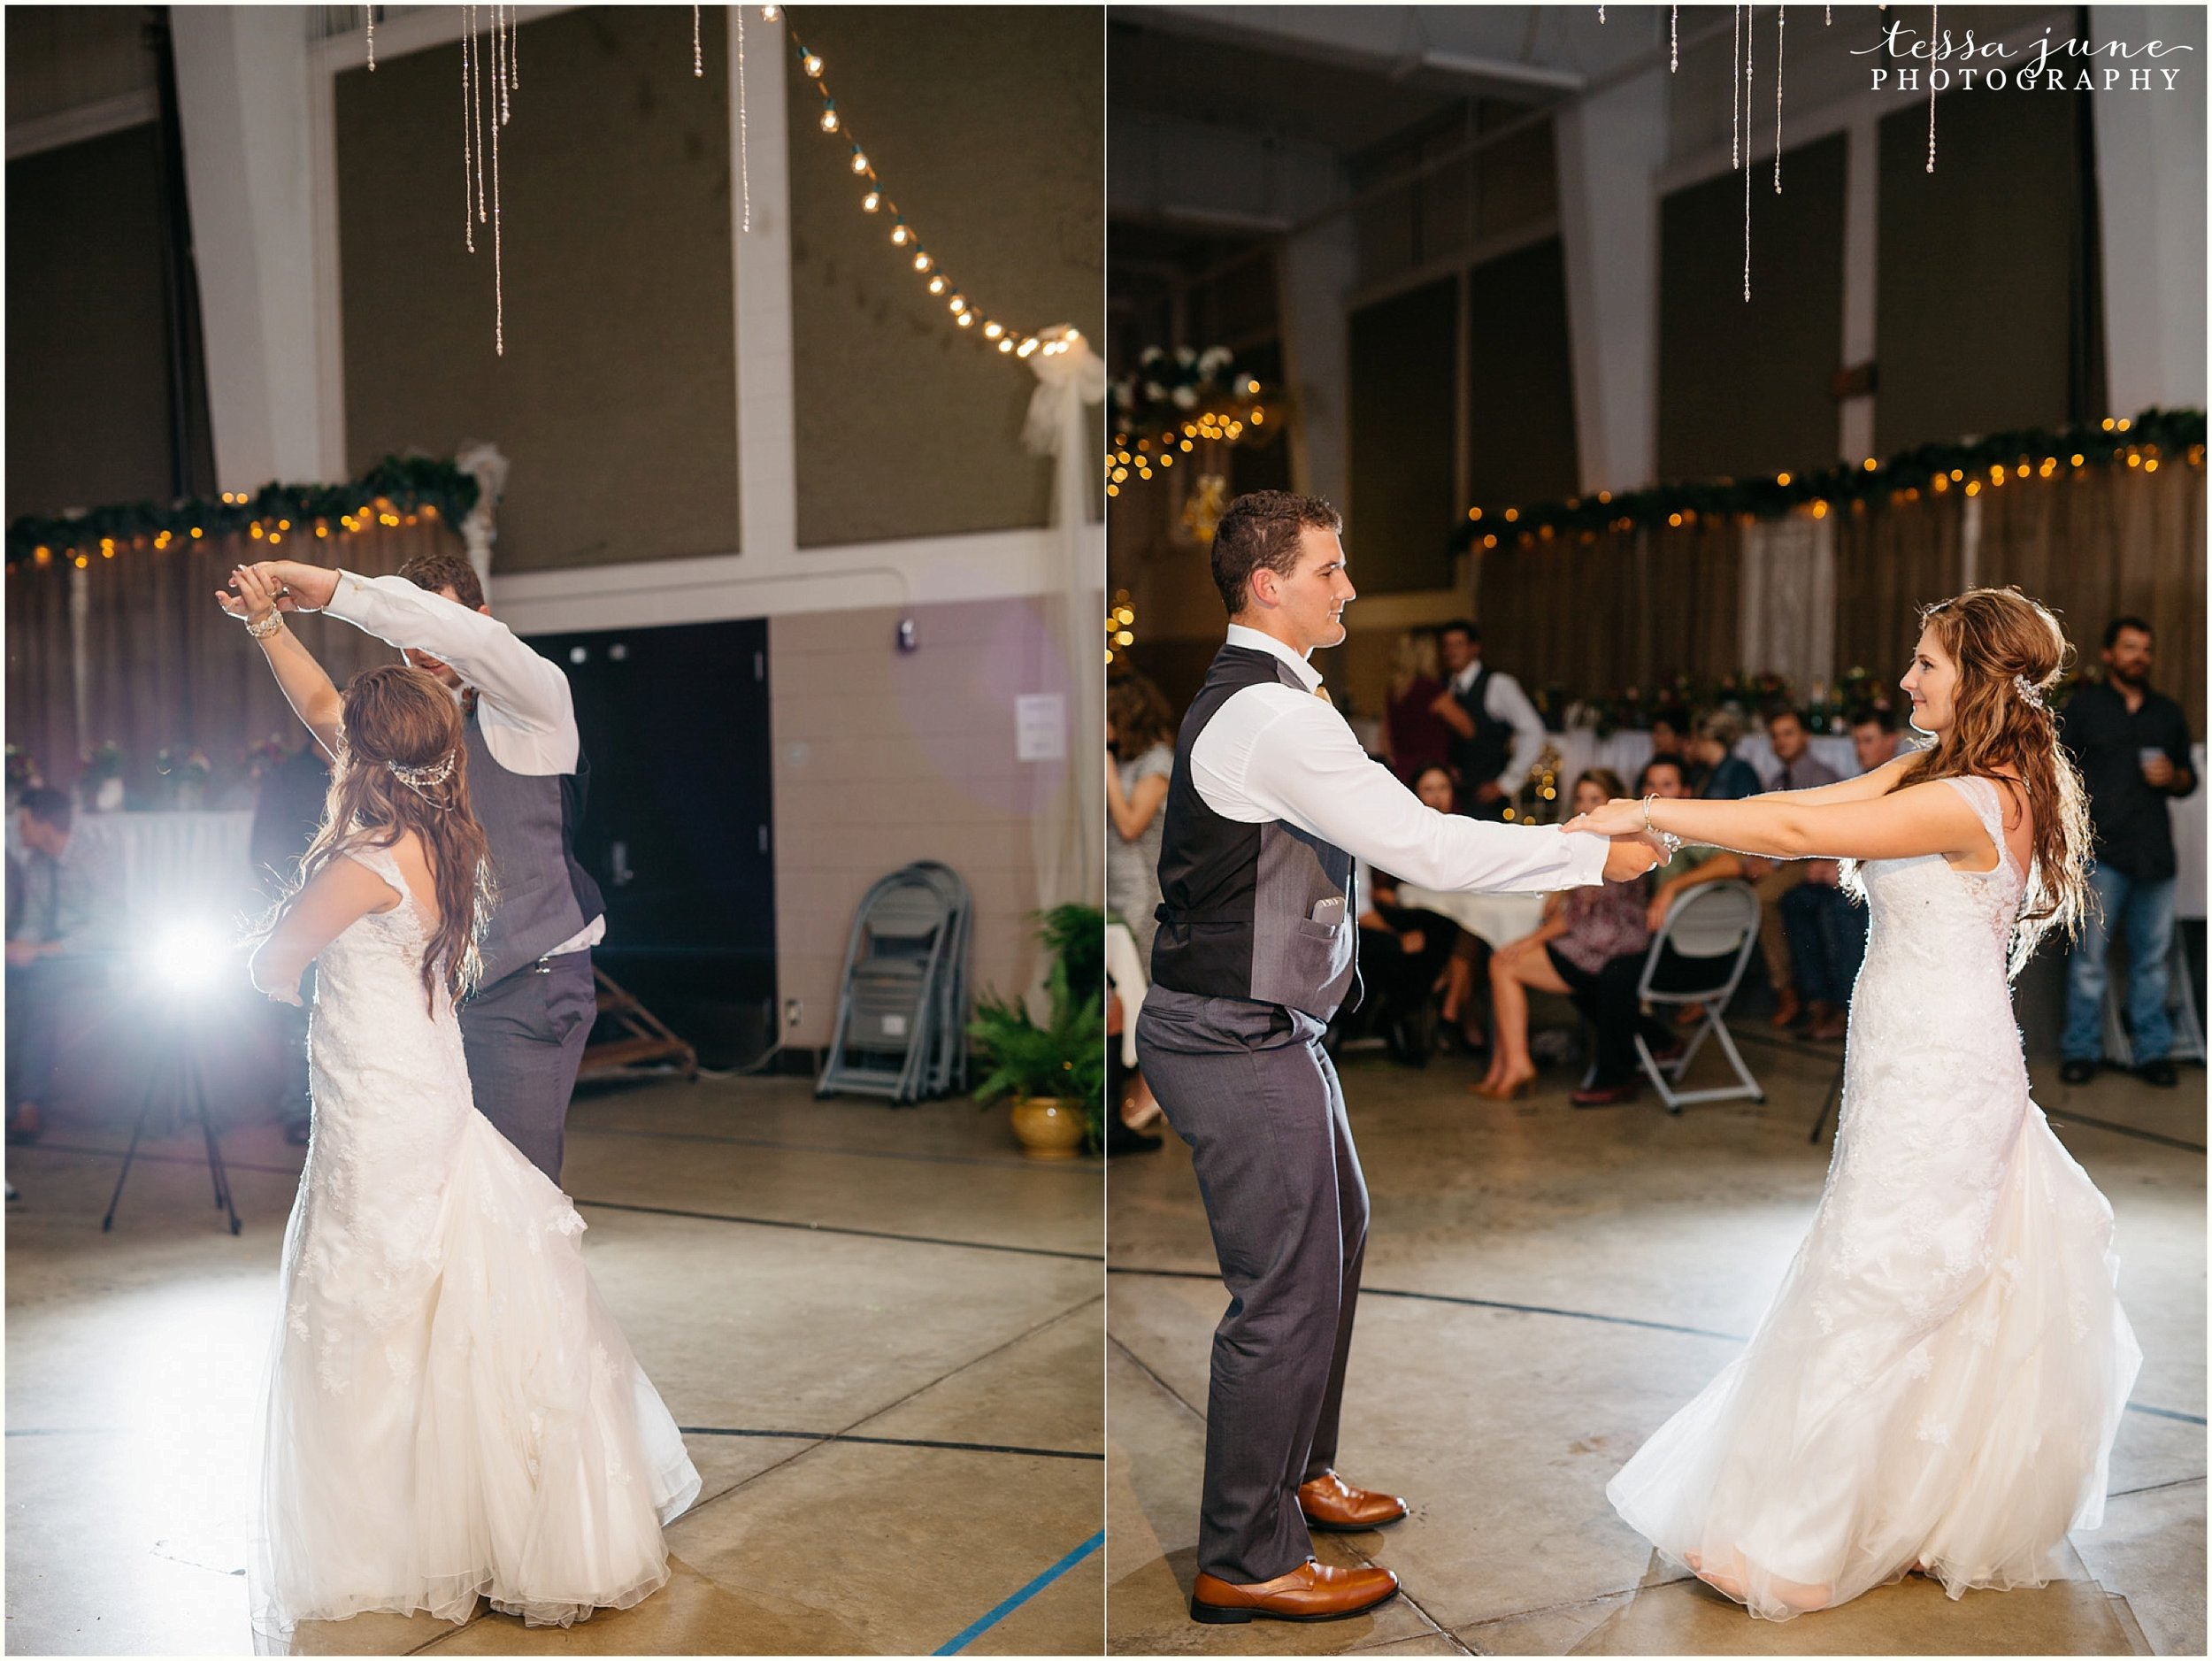 bohemian-minnesota-wedding-mismatched-bridesmaid-dresses-waterfall-st-cloud-tessa-june-photography-198.jpg